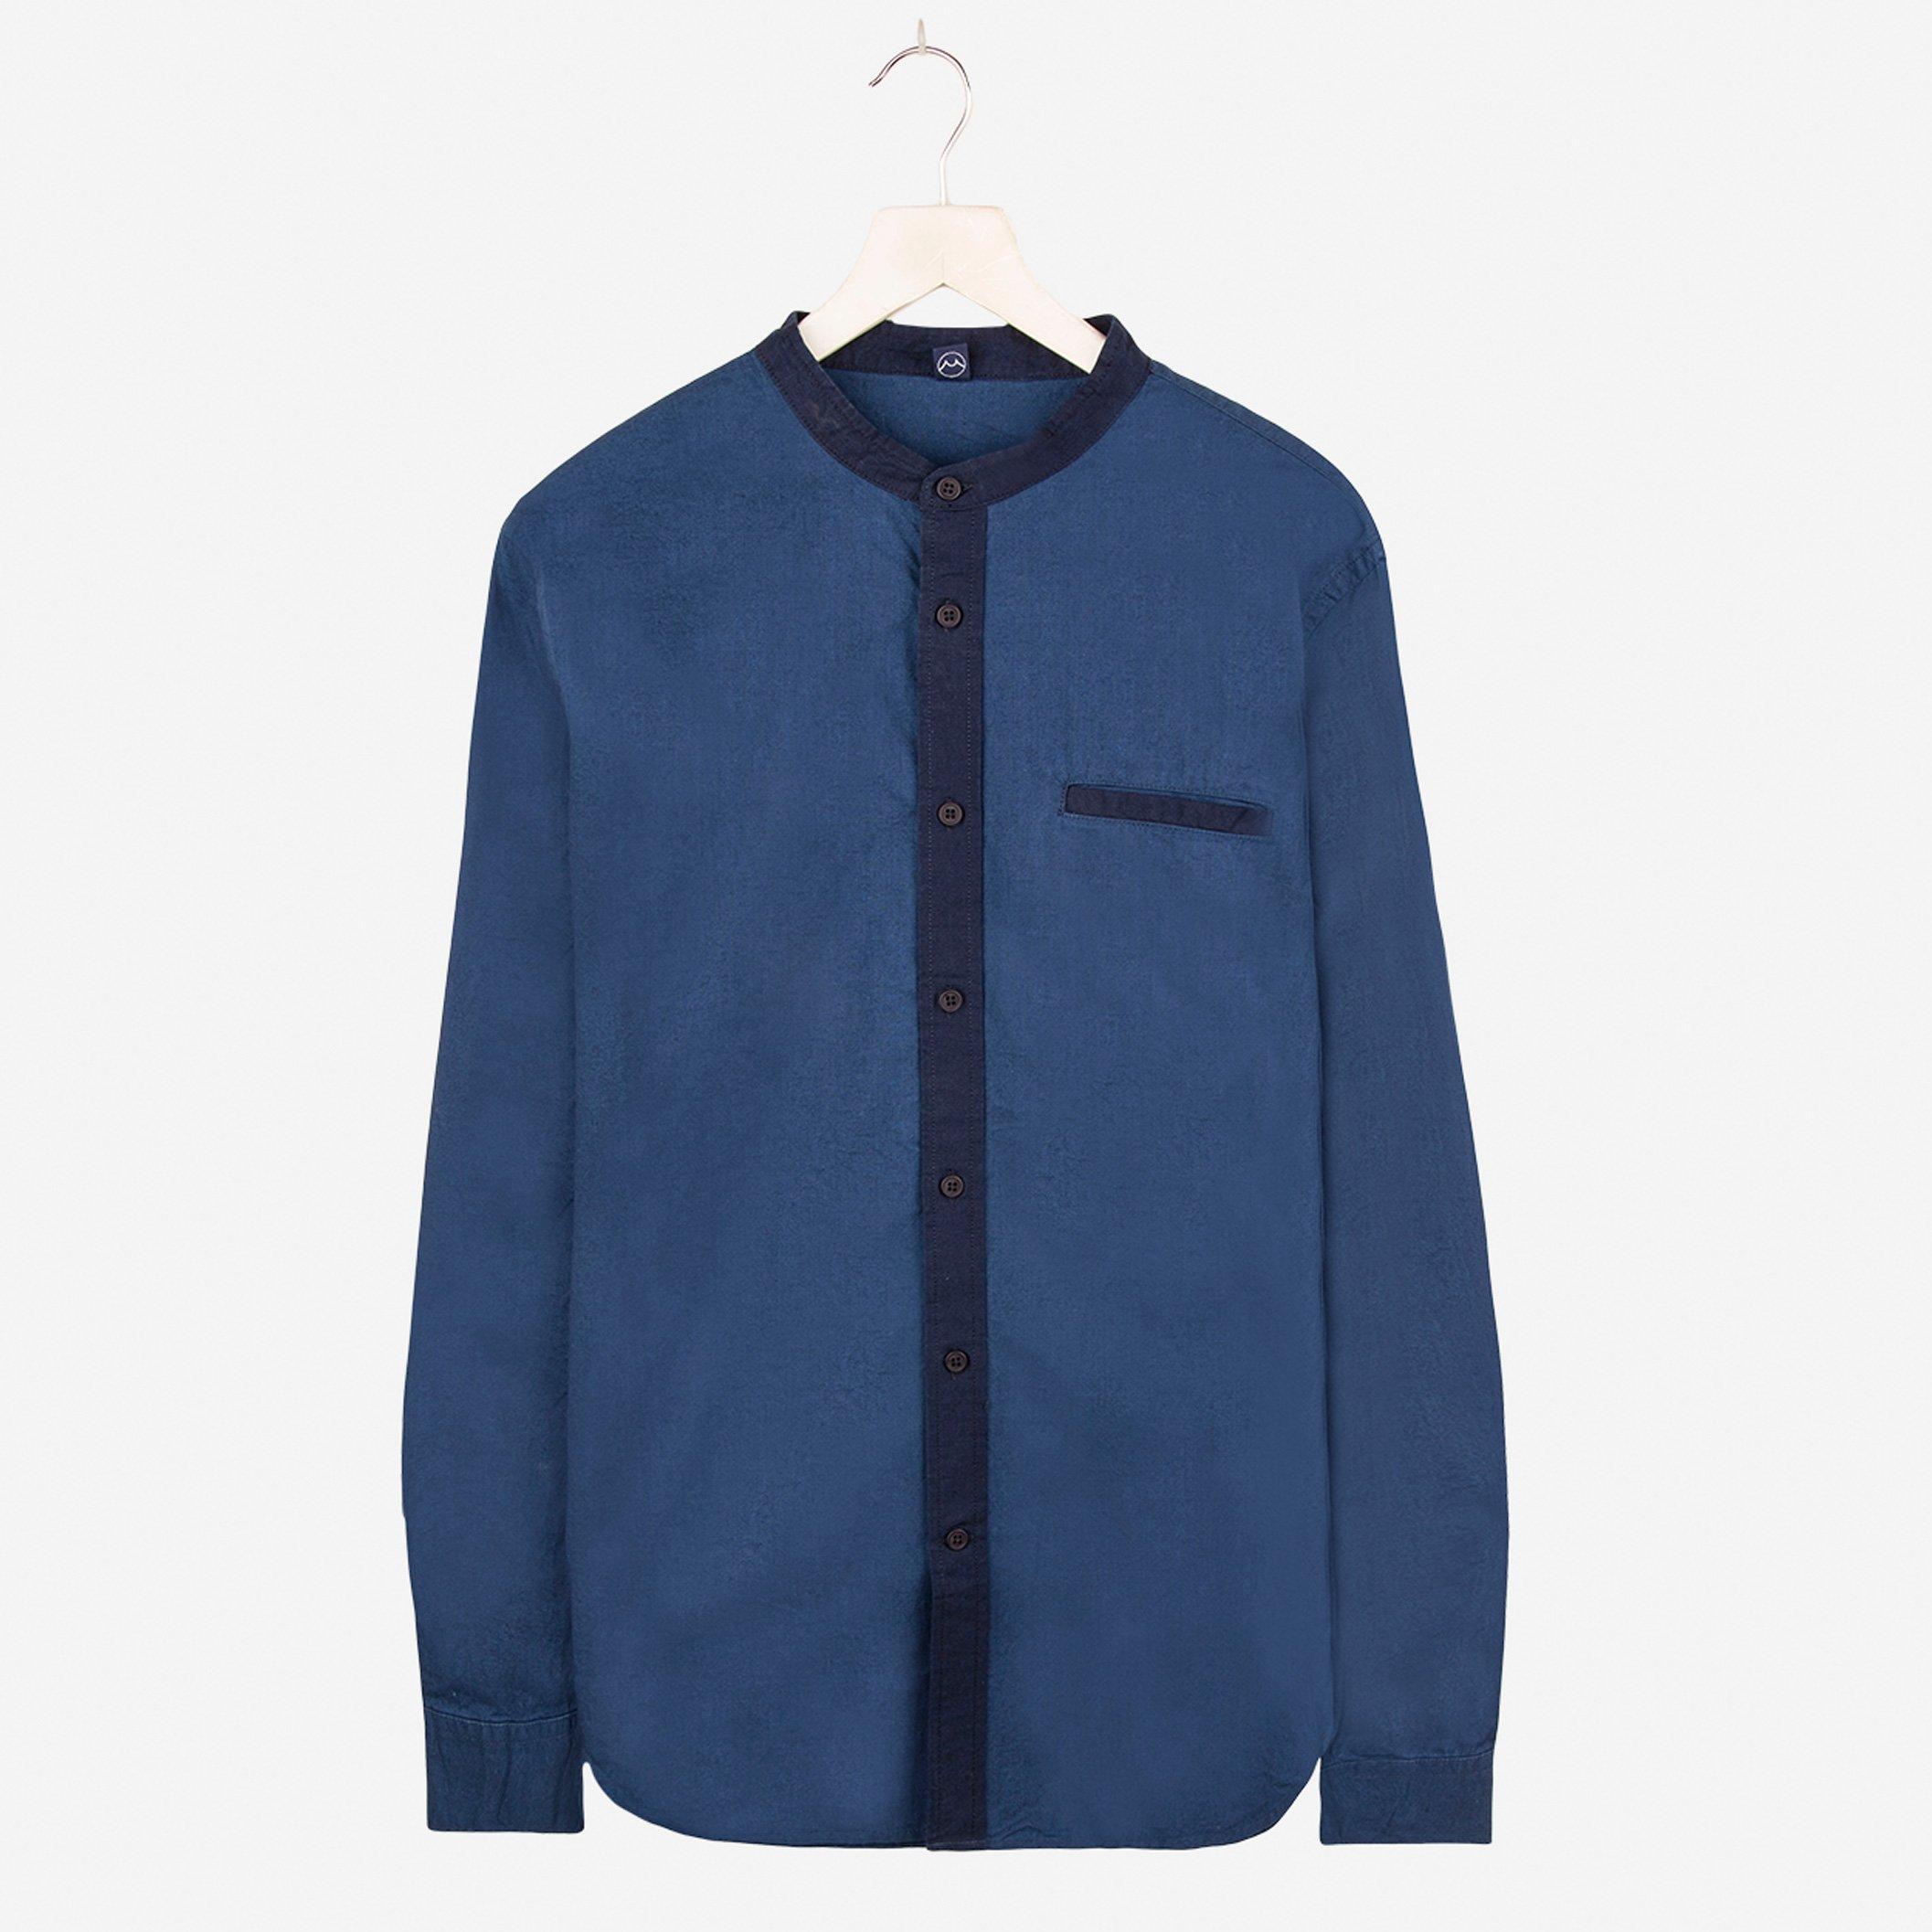 Edwin Oldman Shirt